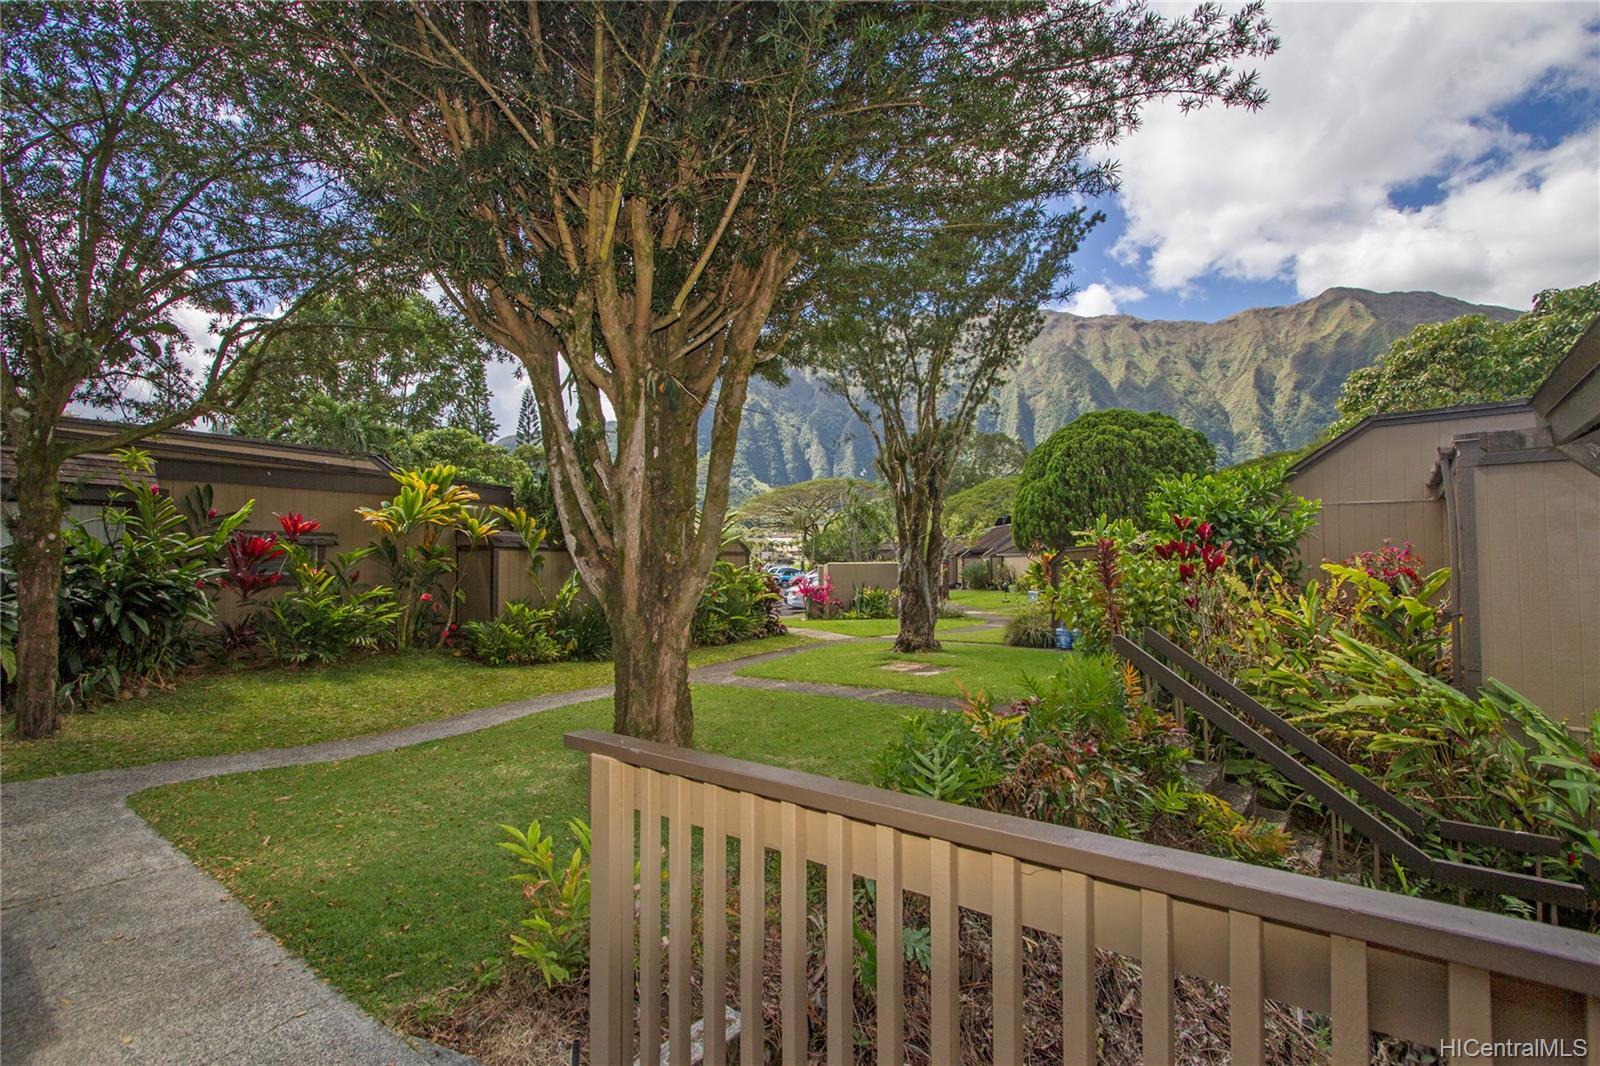 47-455 Hui Iwa Street townhouse # 33/302, Kaneohe, Hawaii - photo 19 of 20